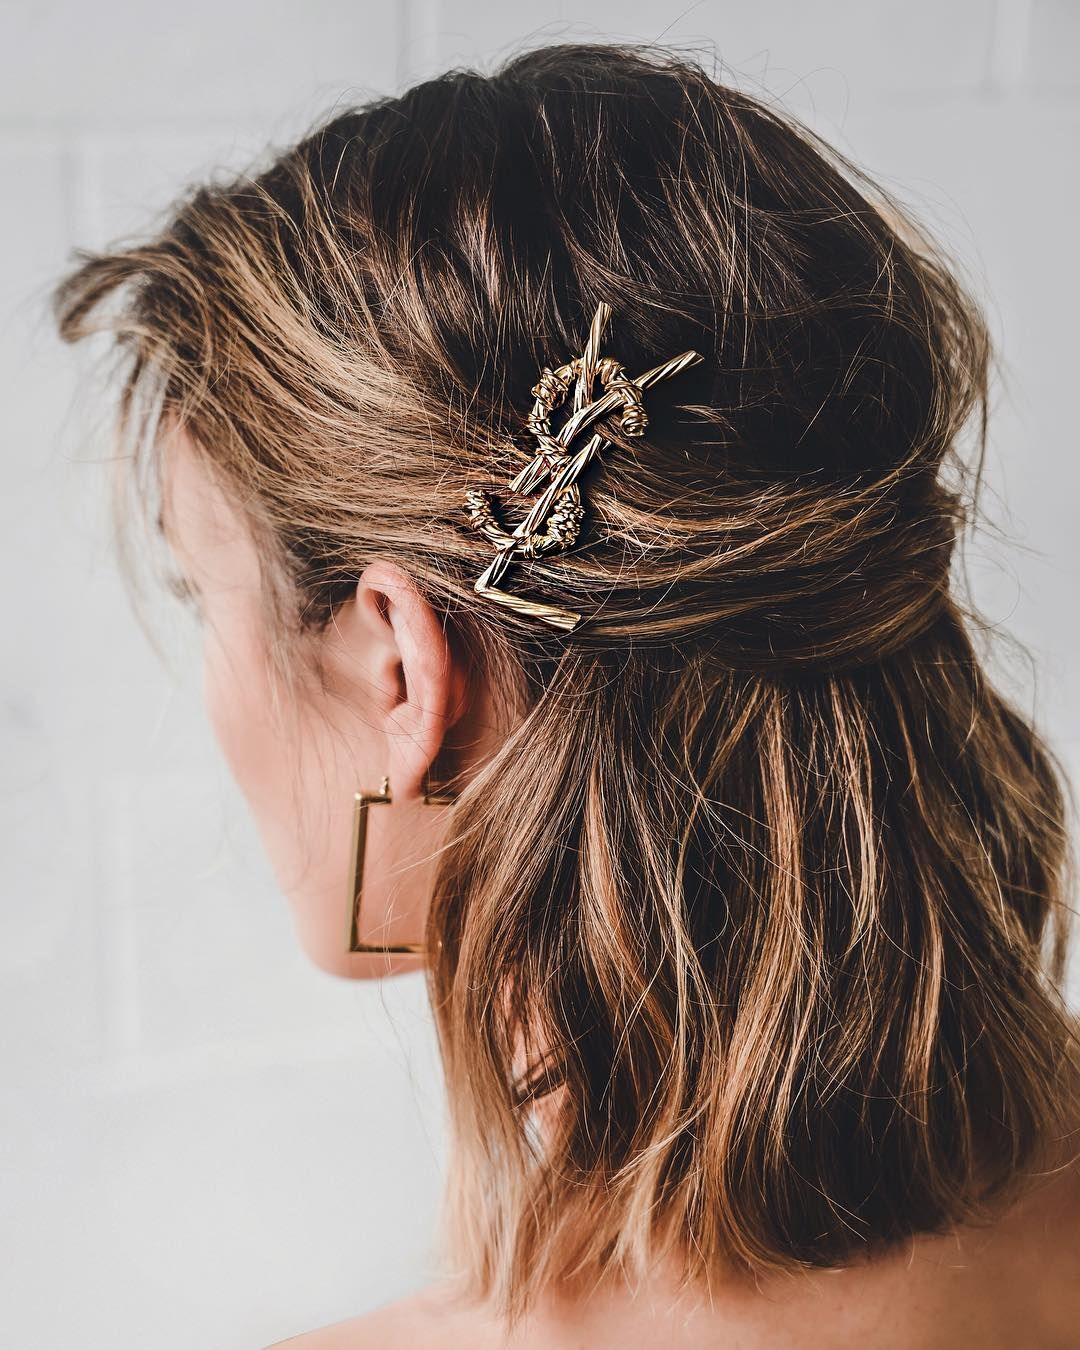 Hair clips are my weakness. YSL hair clips 🖤 @ysl @harroldsaus